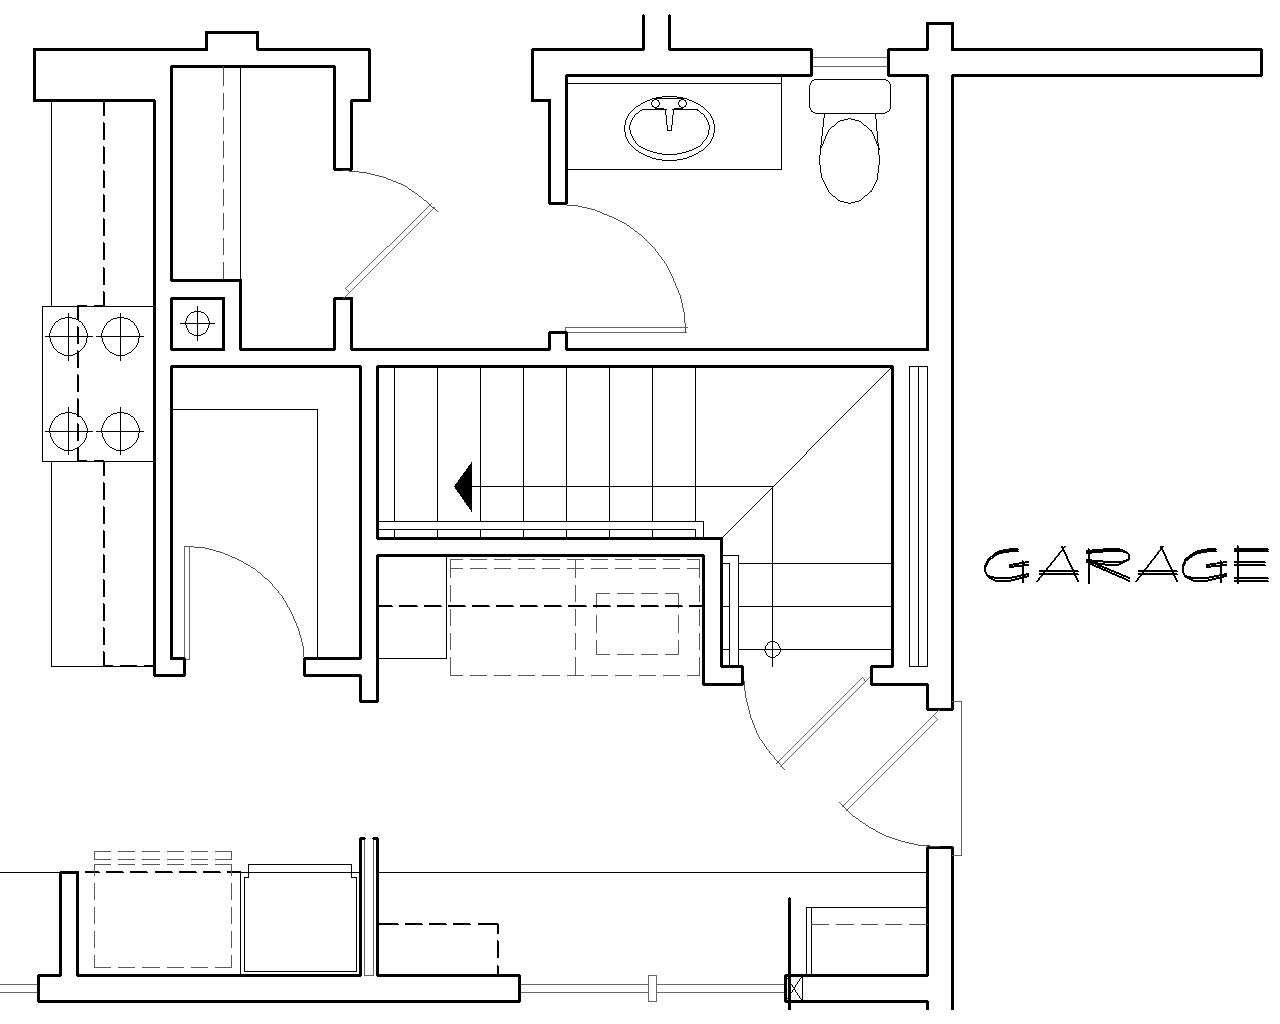 House antrim house plan green builder house plans for Builder house plans com